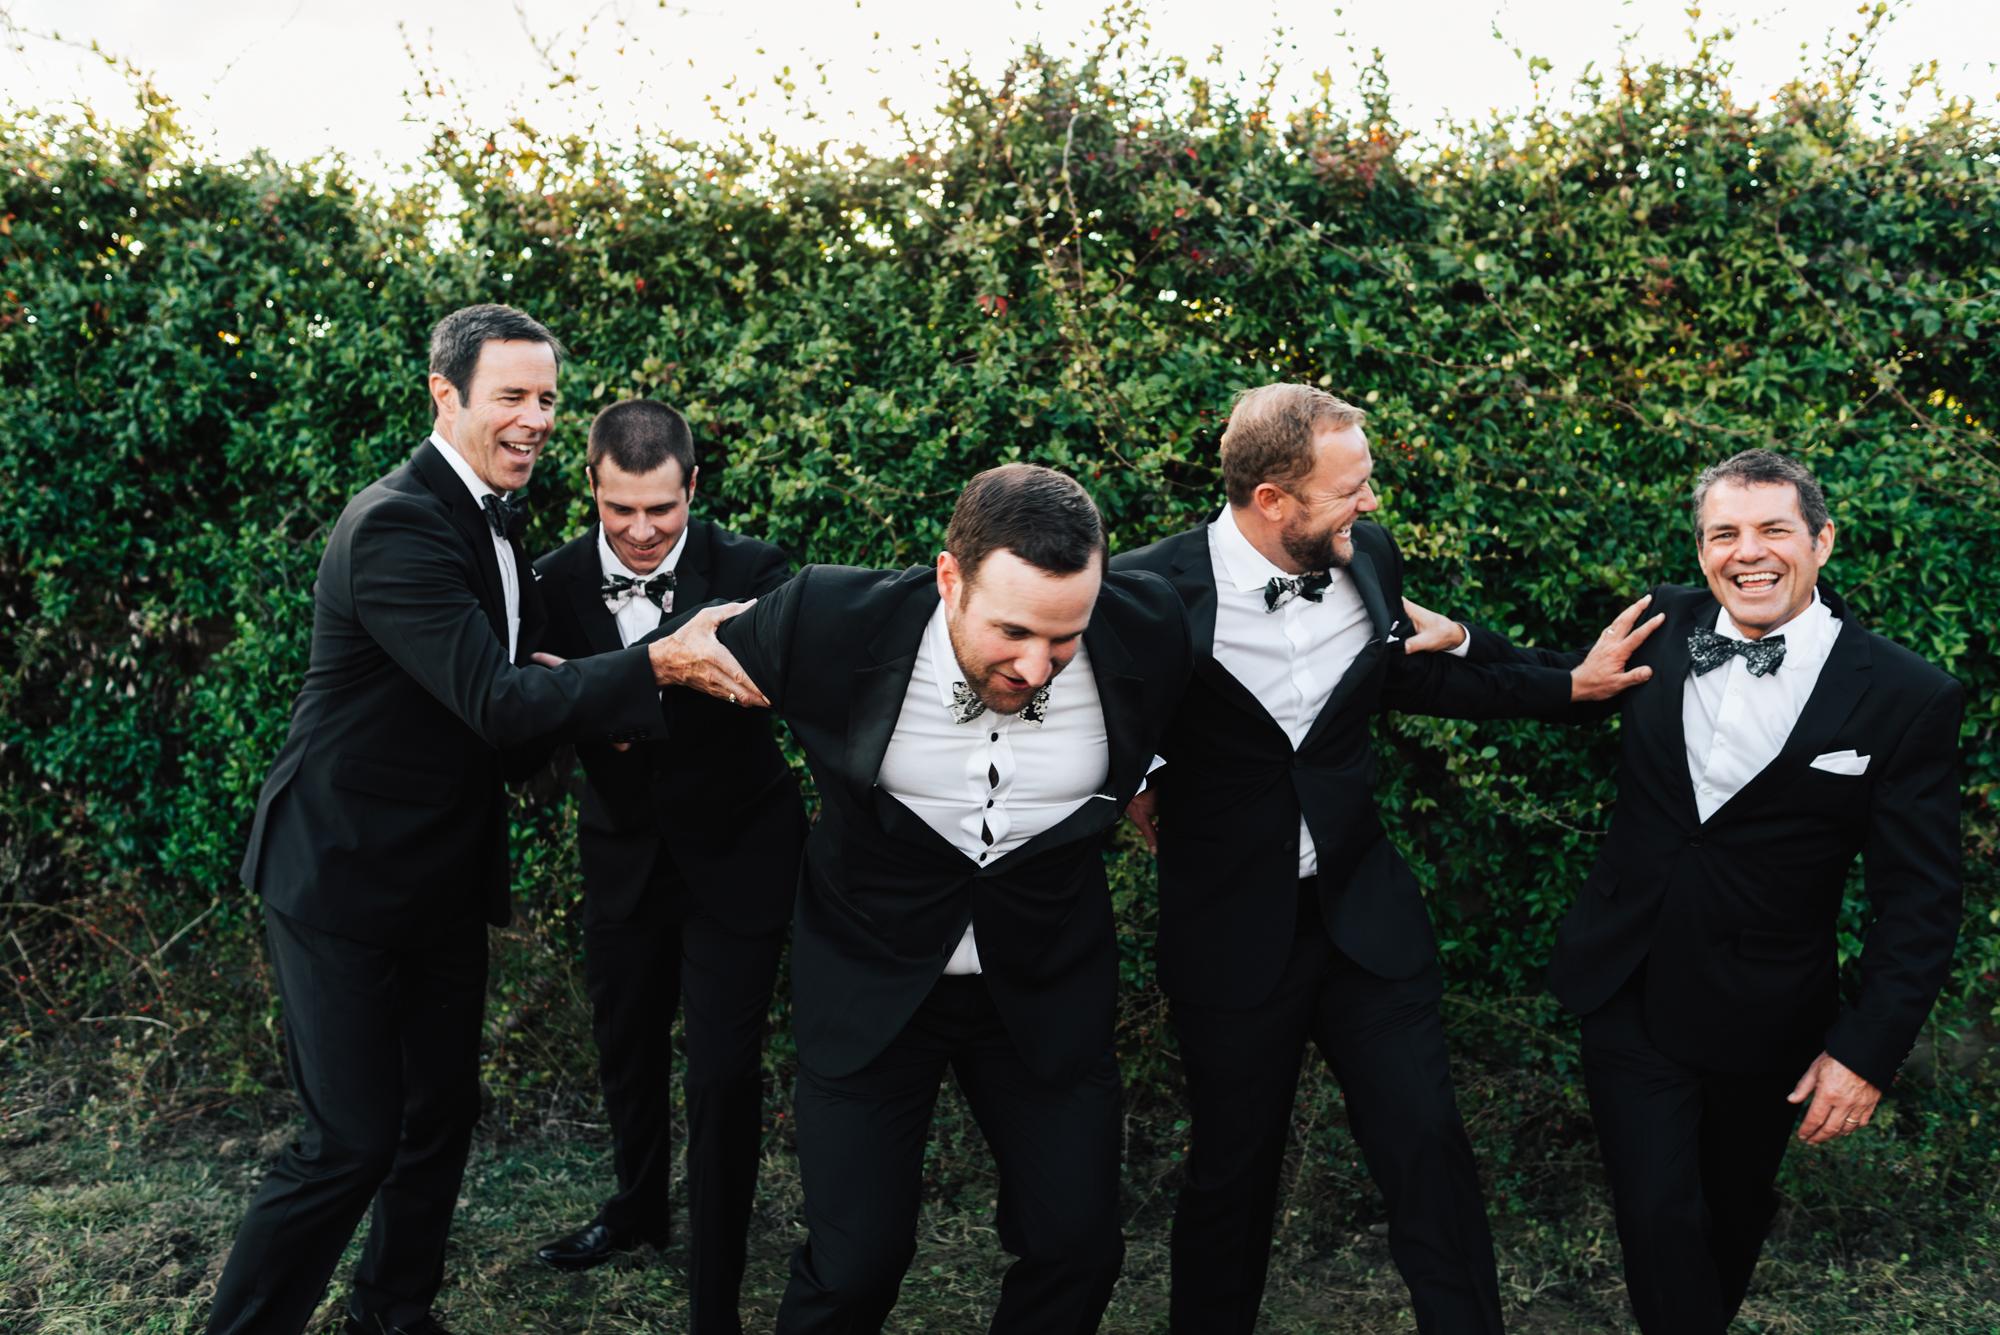 SamErica Studios - Cortona Italy Wedding -  Modern Destination Wedding photographers - fun groomsmen portraits